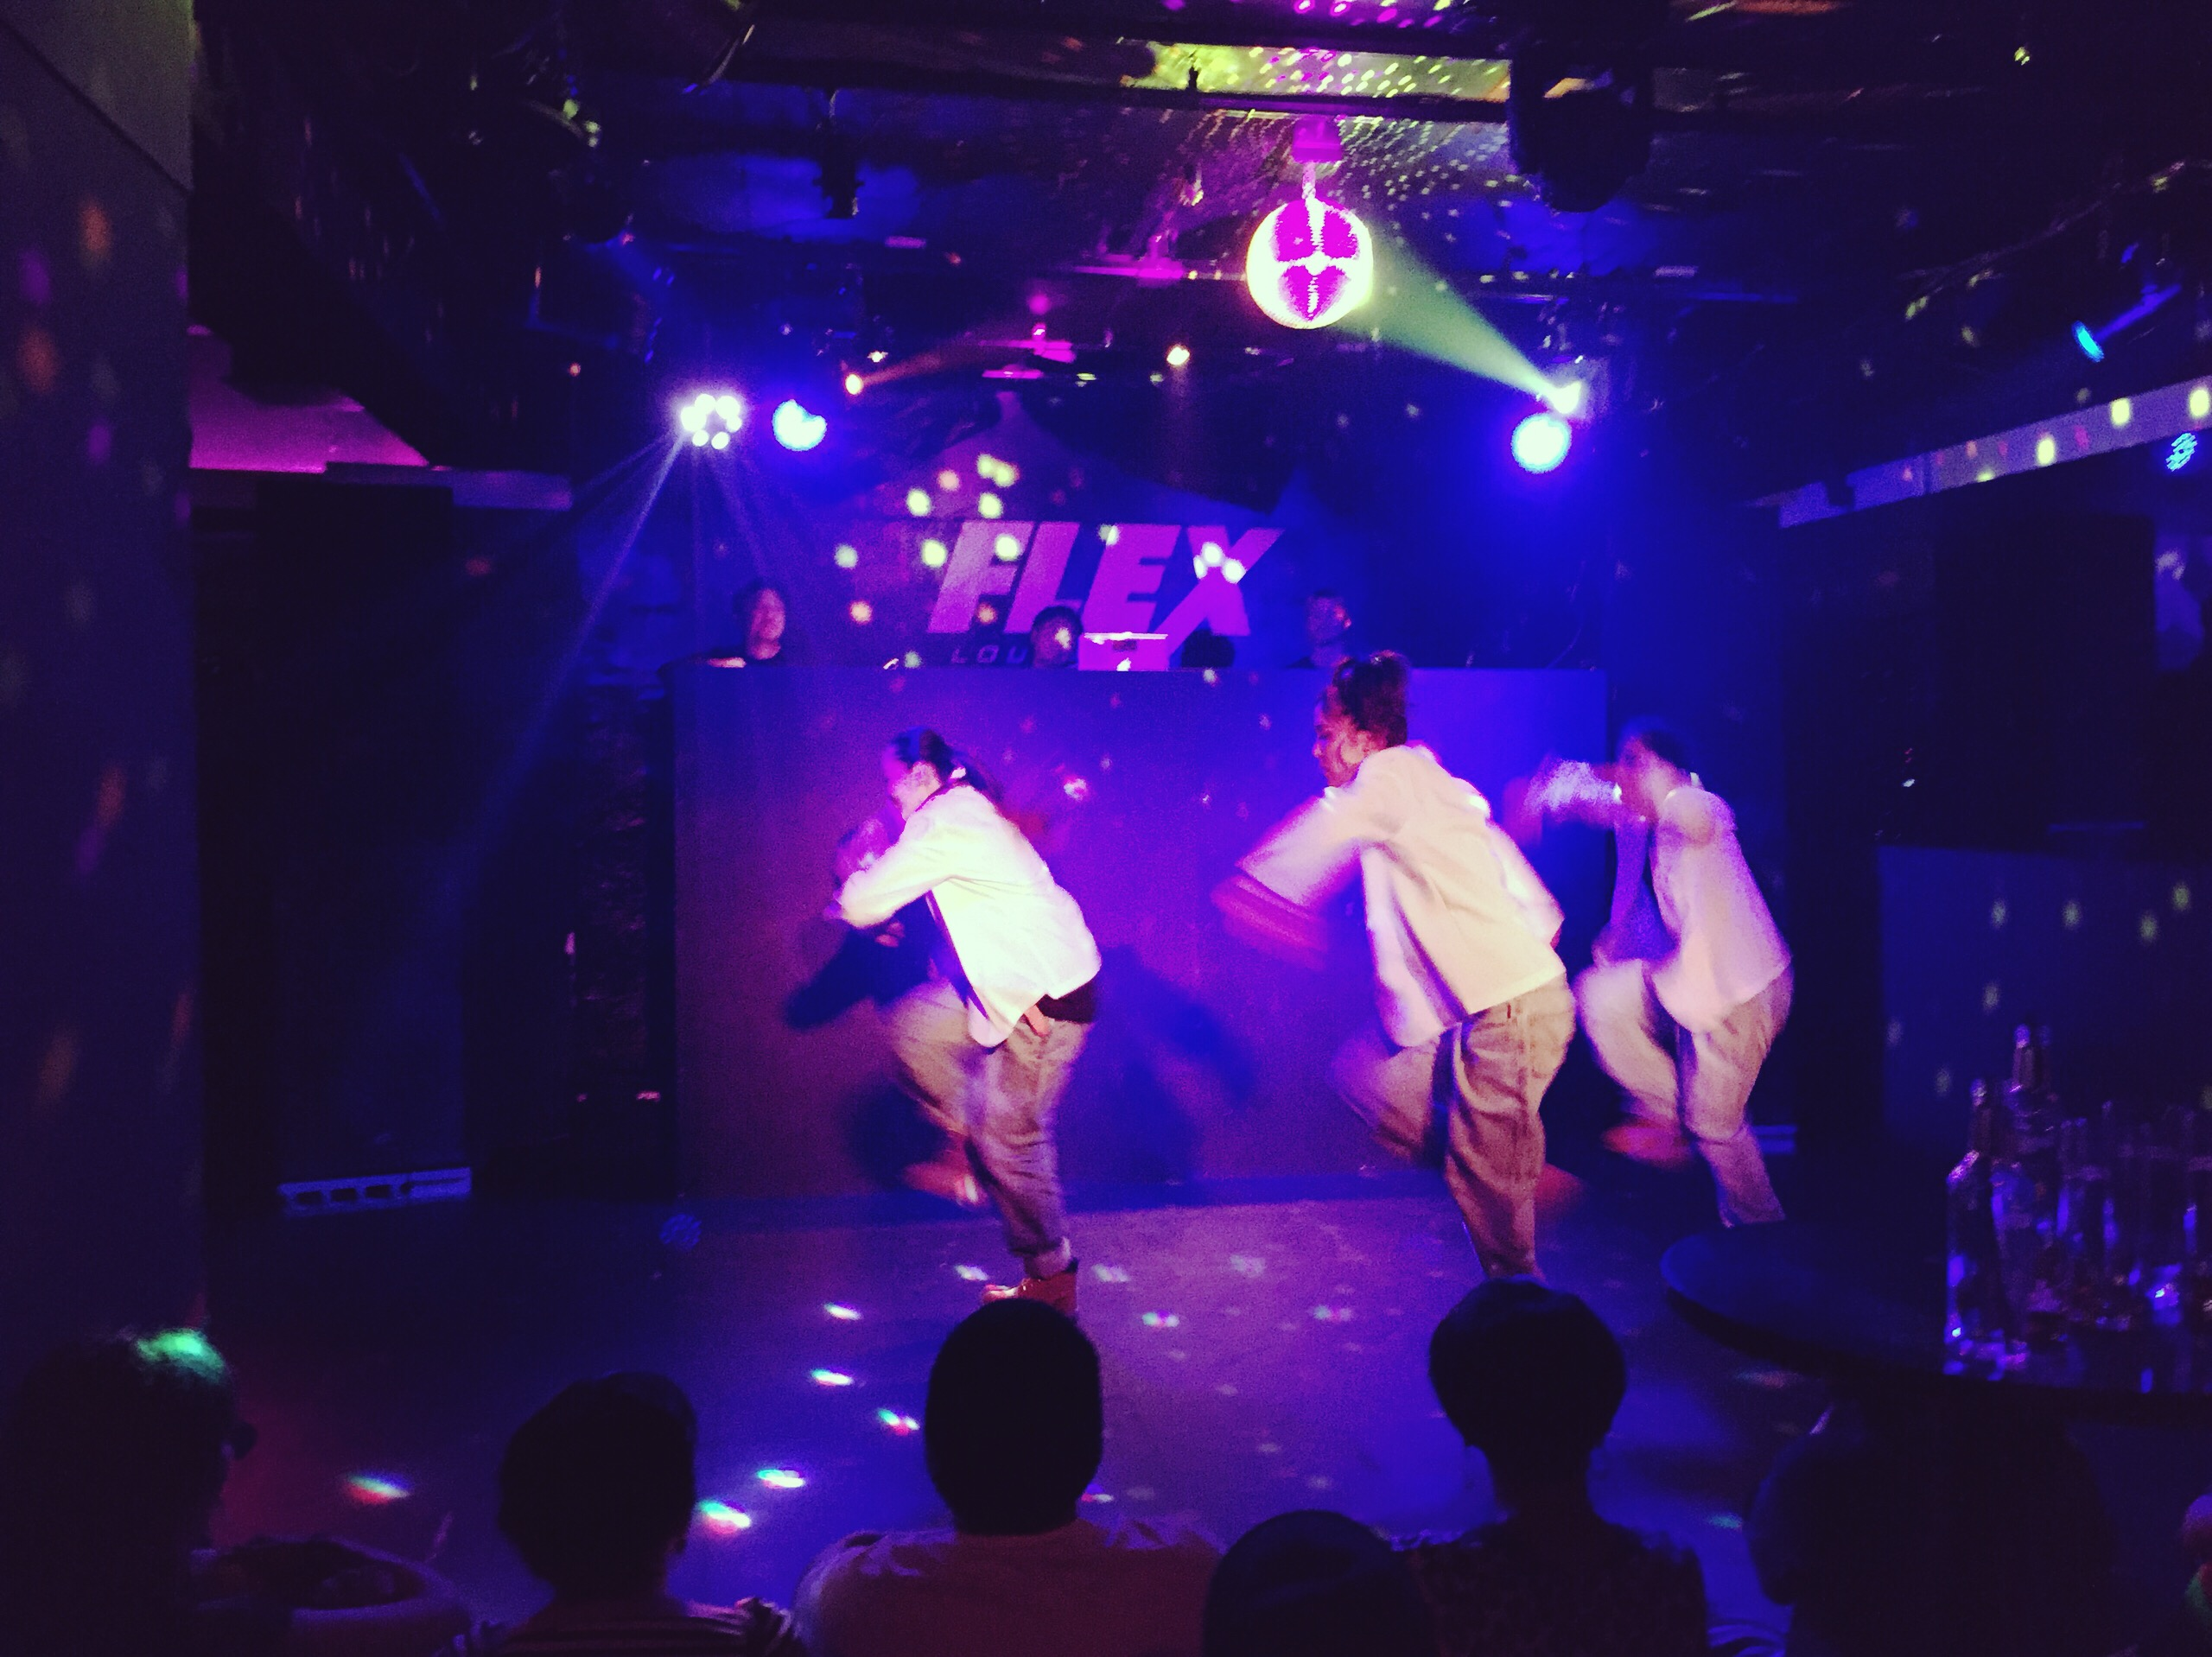 dancelabo_danlabo_suits_jacket_loBabees_hiphop_ヒップホップ_レディース_スーツ_ジャケット_01